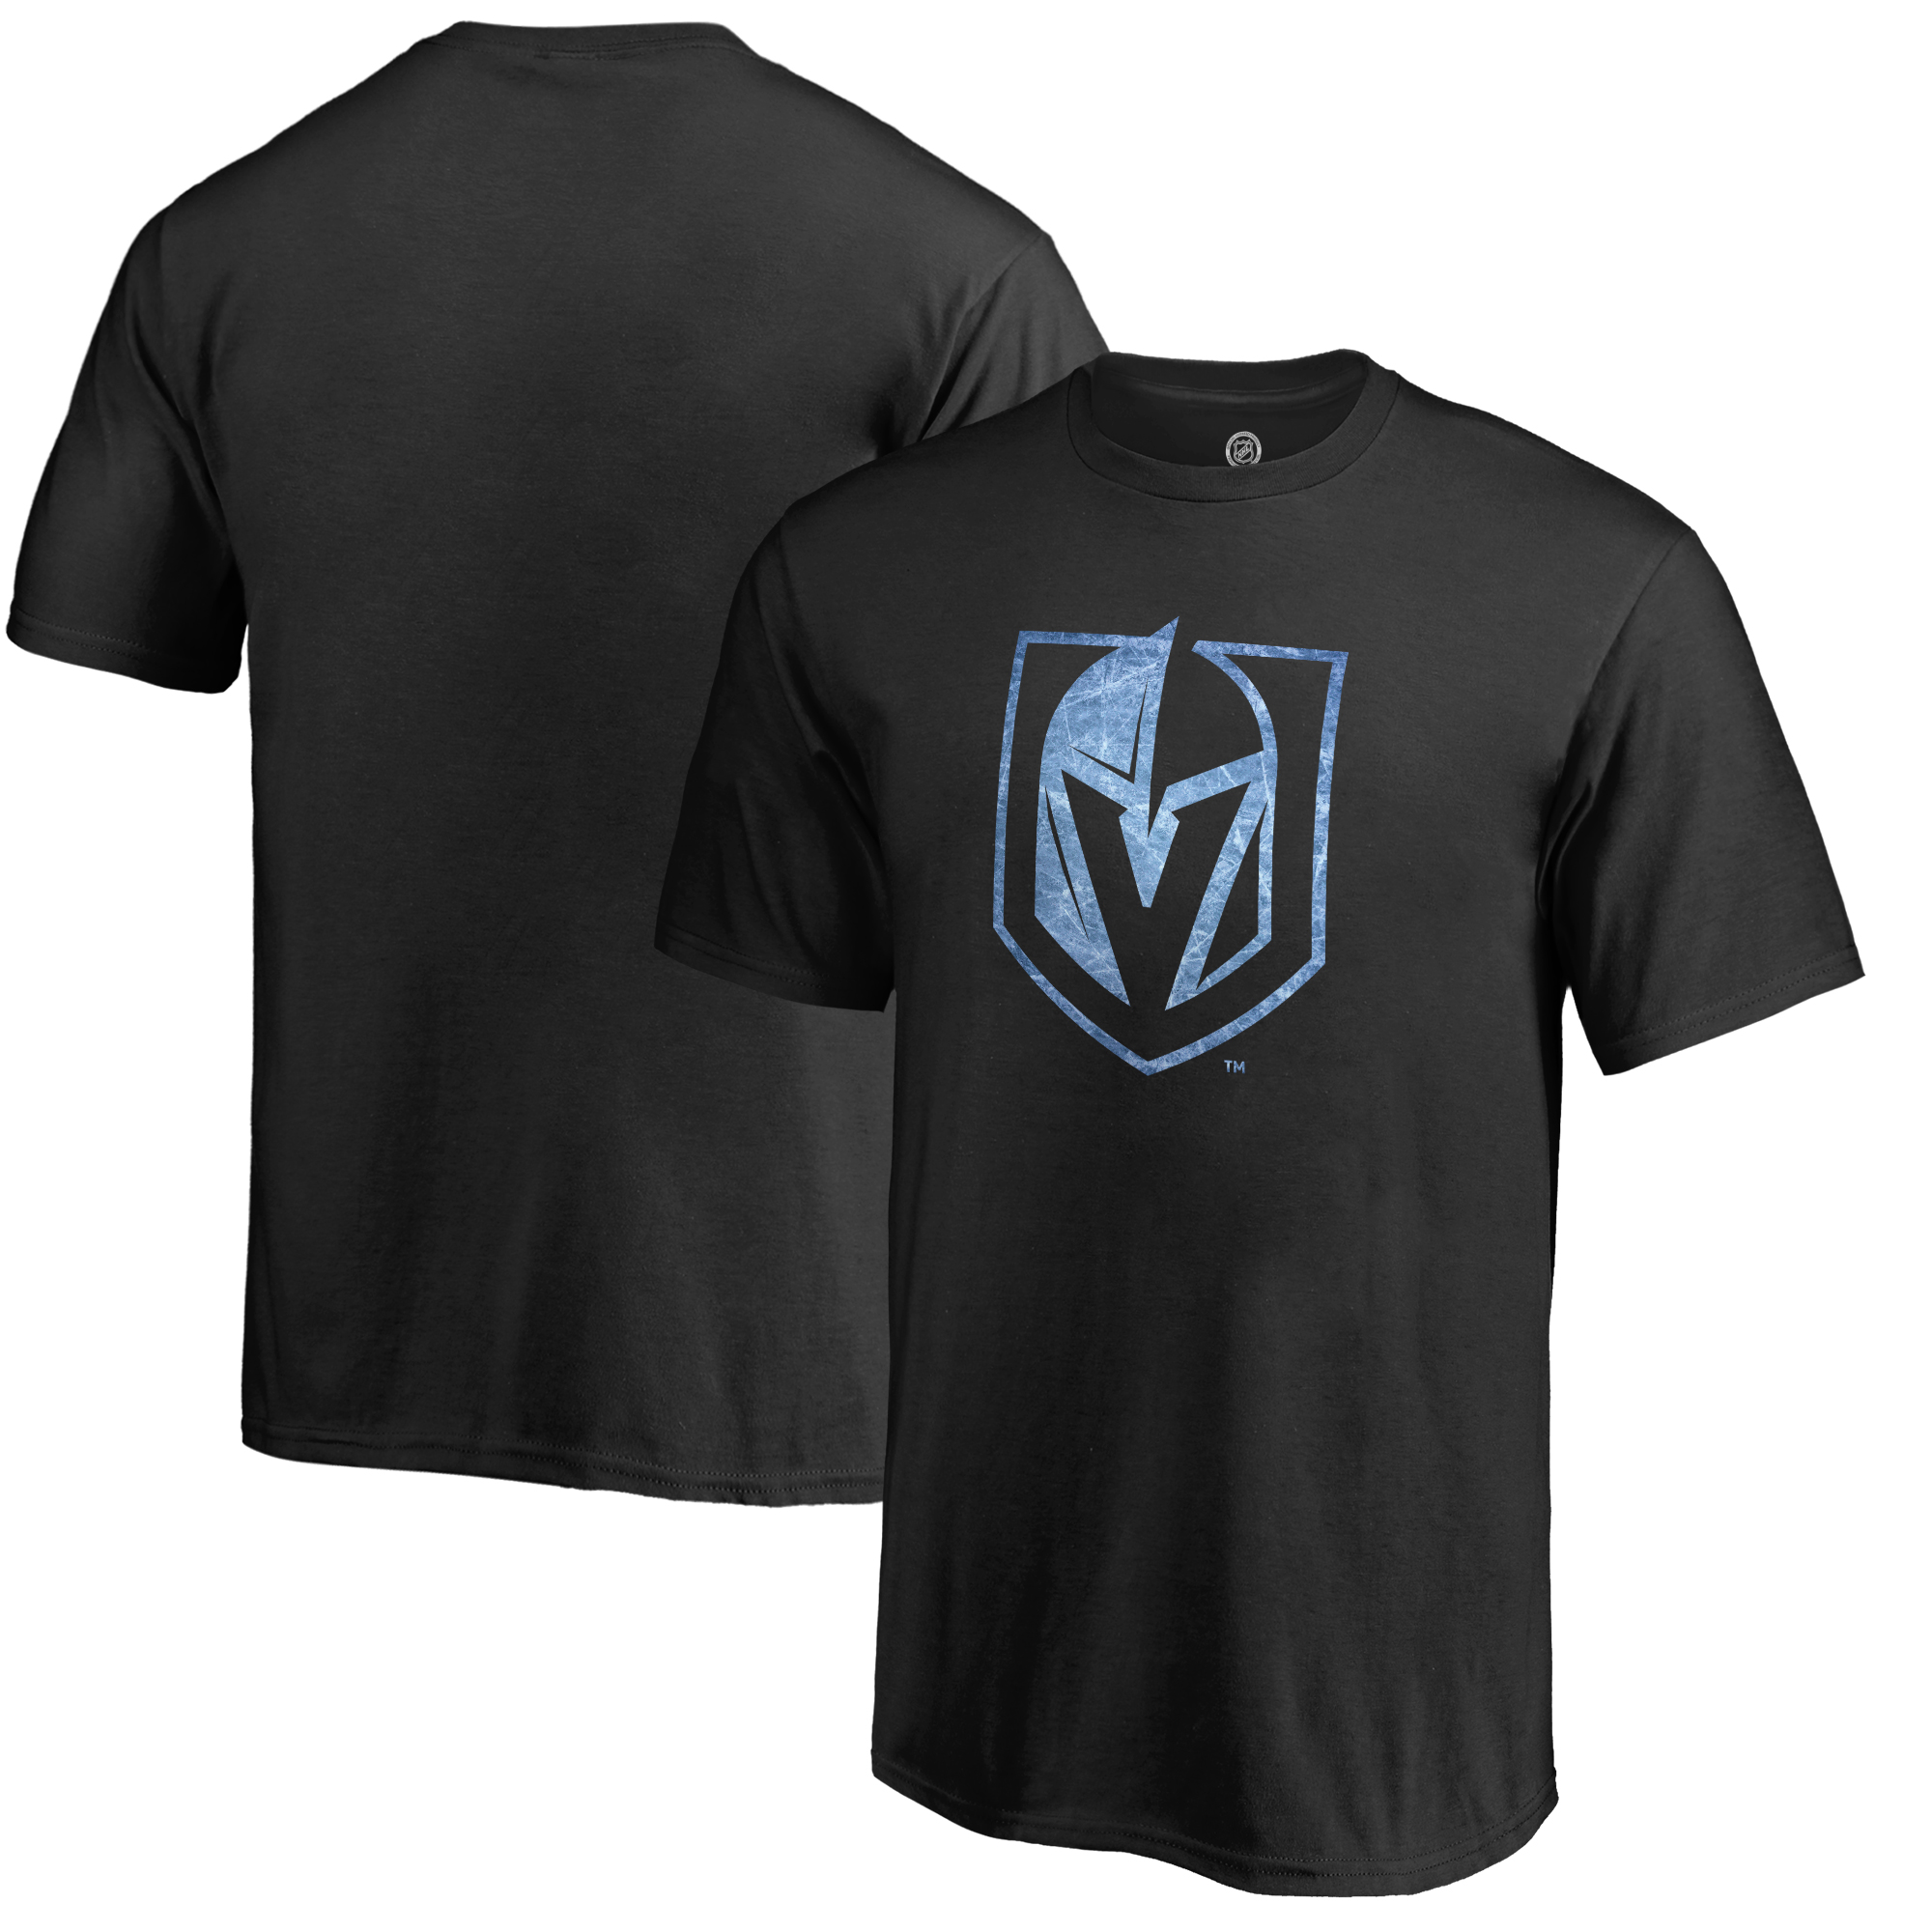 Vegas Golden Knights Fanatics Branded Youth Pond Hockey T-Shirt Black by Football Fanatics/Ruppshirts